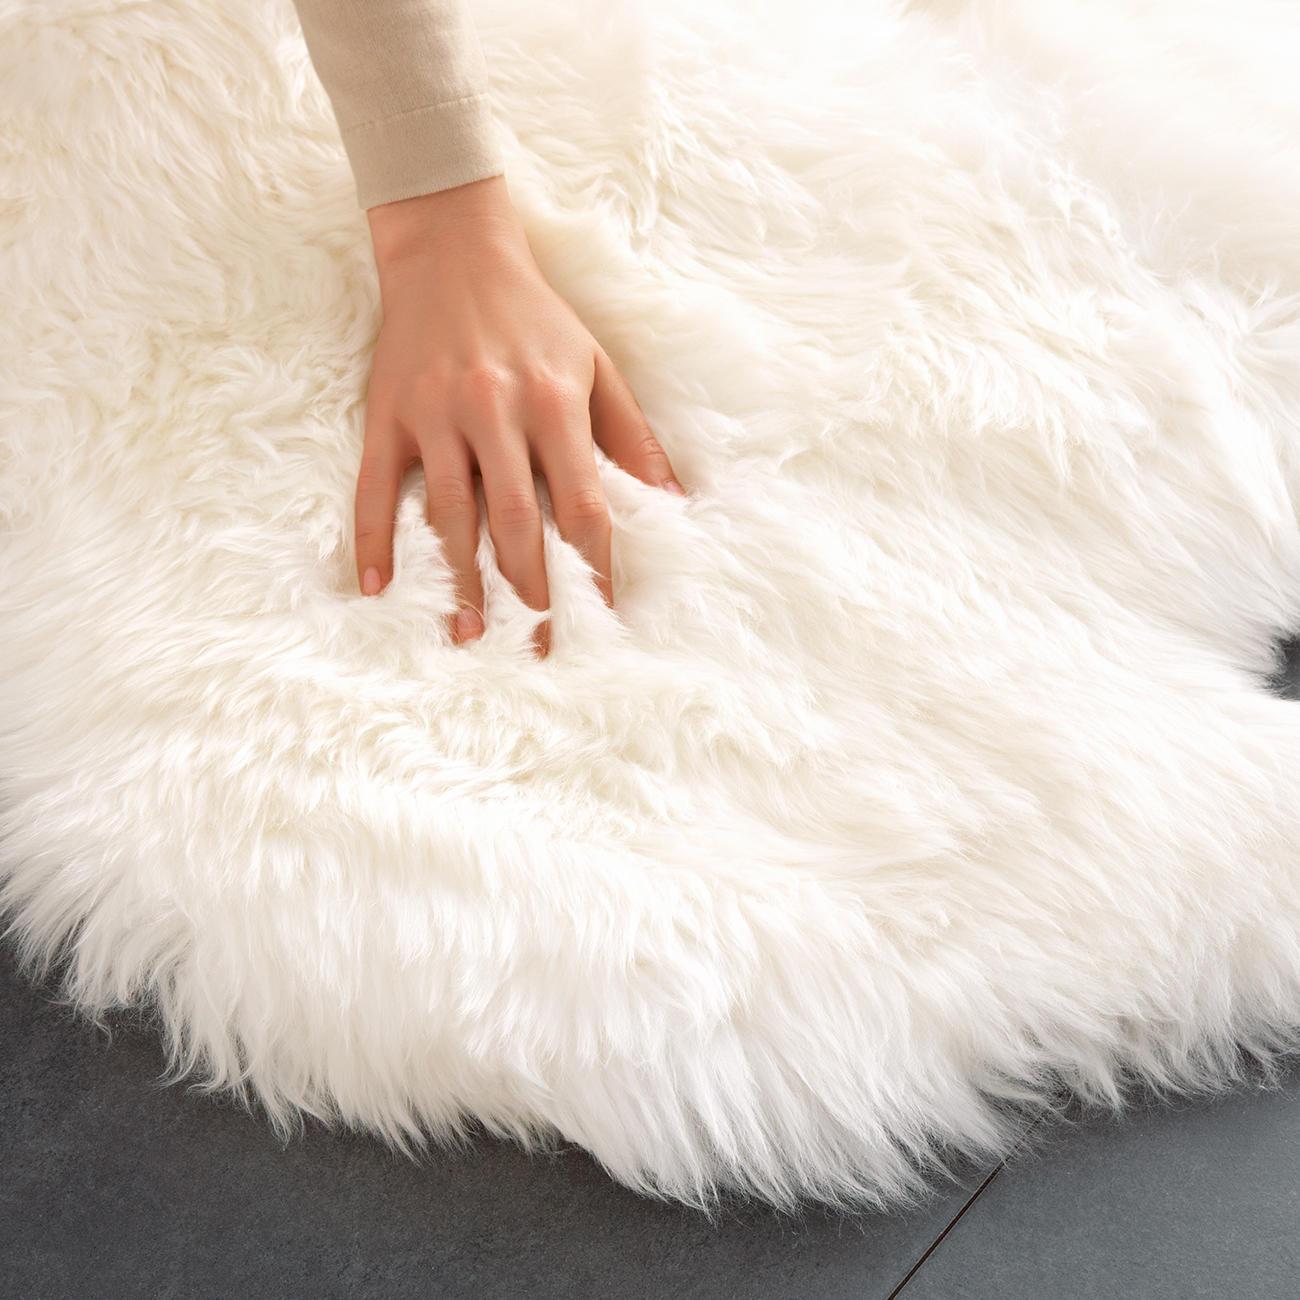 Lammfell teppich   160 x 100 cm groß und sogar maschinenwaschbar